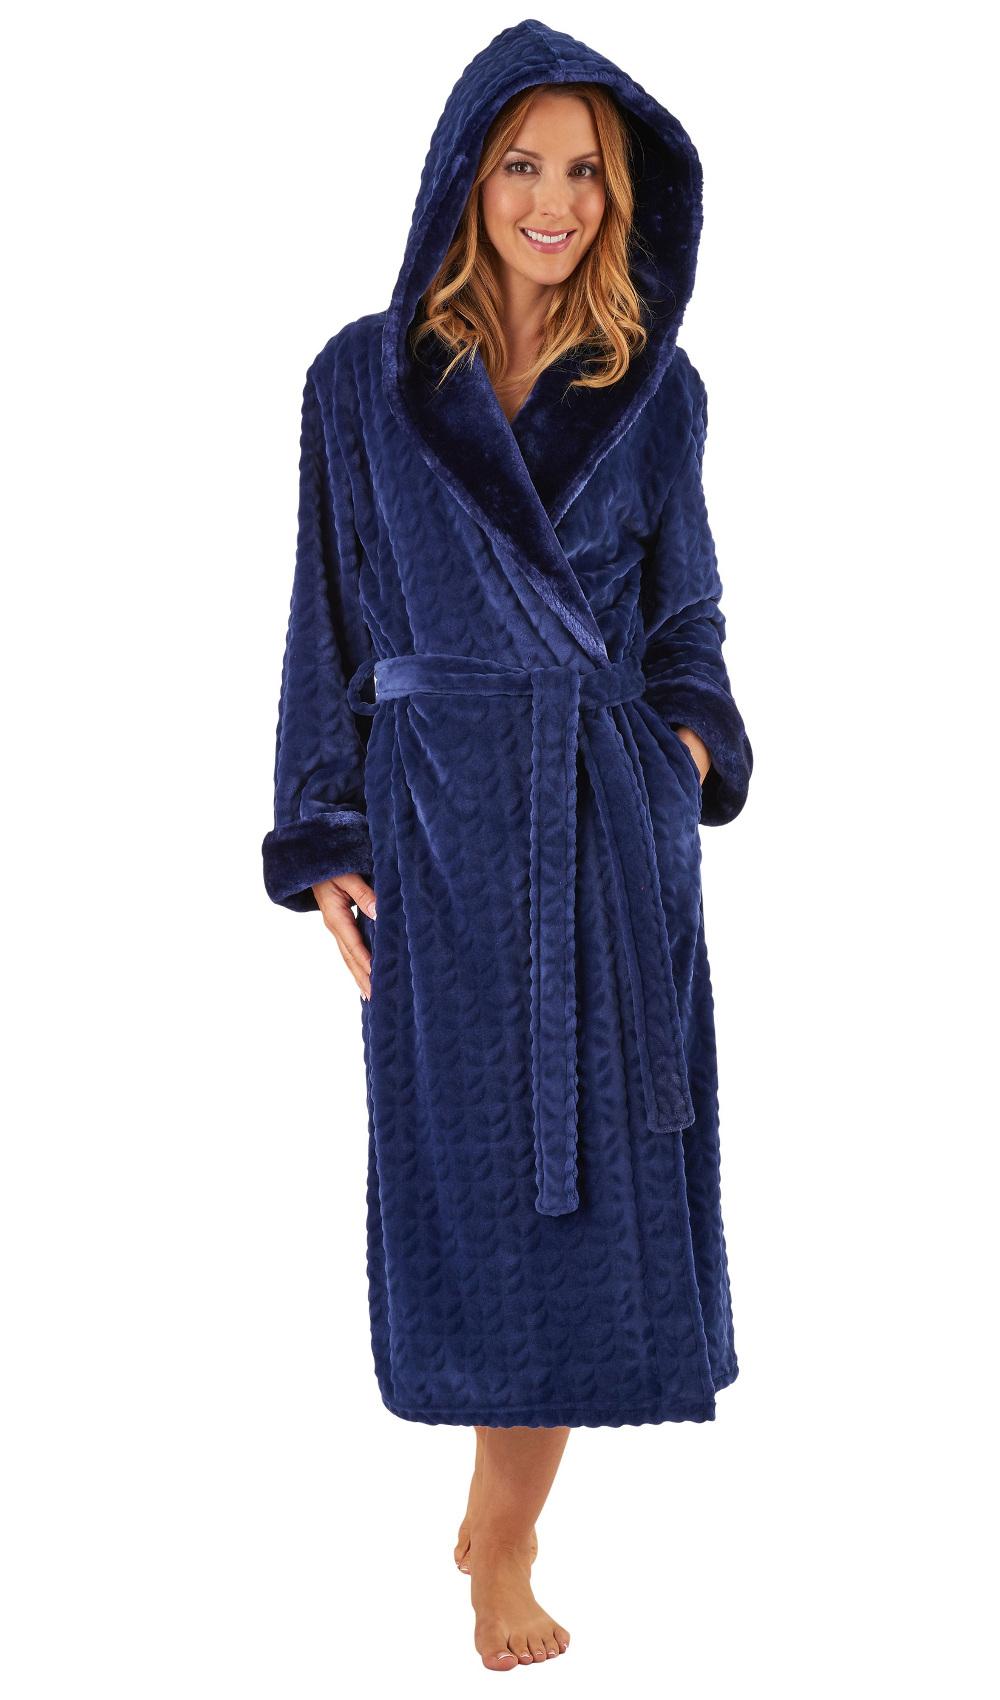 4aacd686dc Dressing Gown Ladies Bathrobe Faux Fur Shawl Collar Hooded Wrap Robe  Slenderella